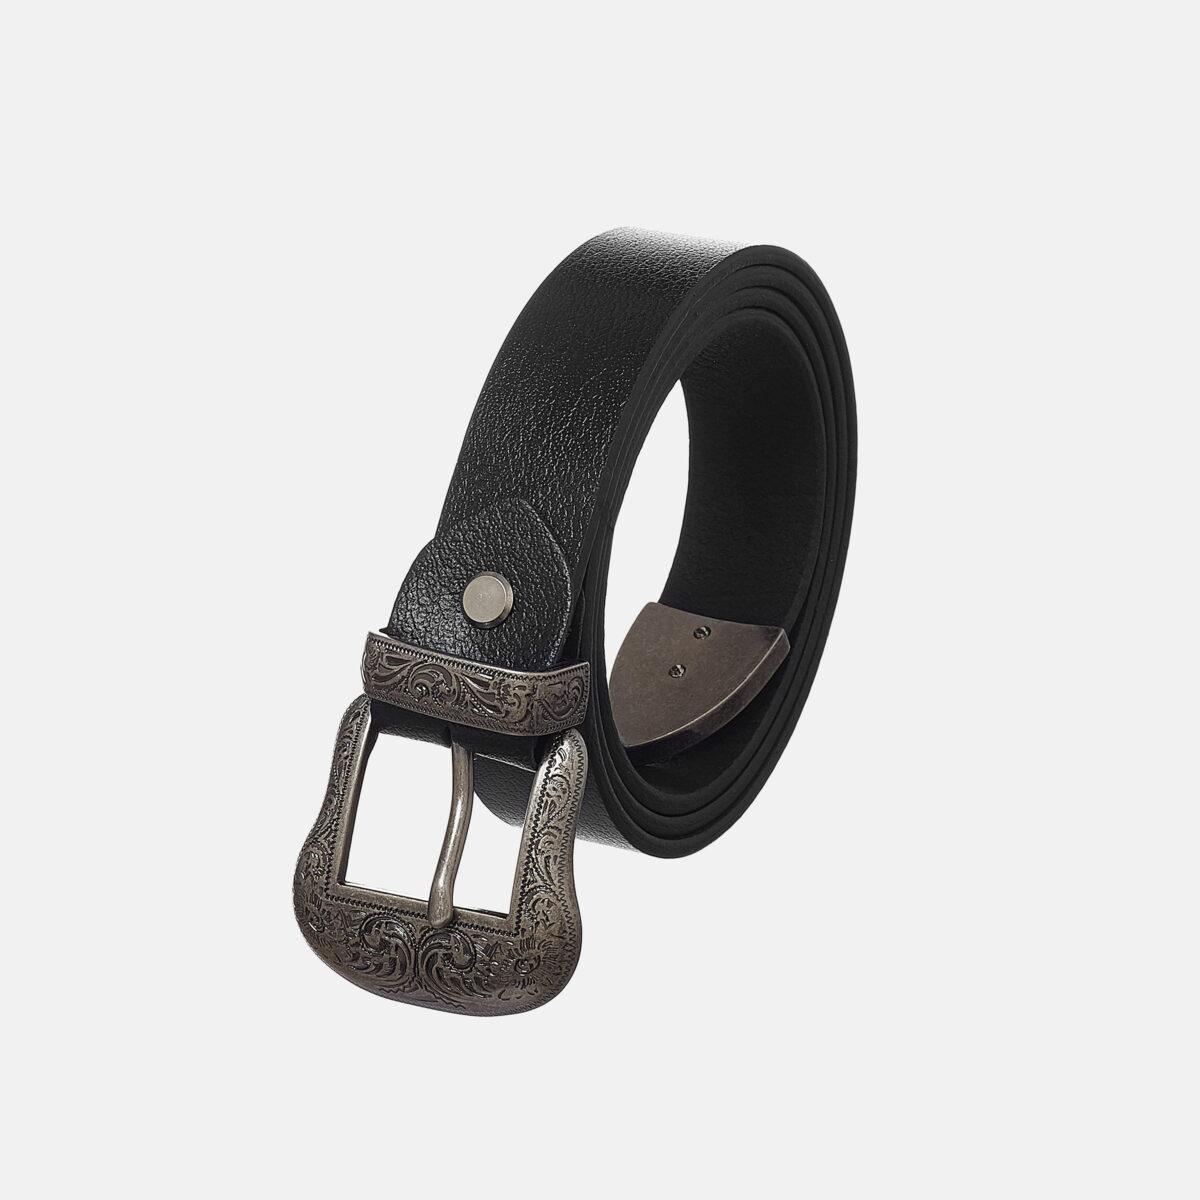 Rowan Aiioy - Belts [BN] Rowan AIIoy Belts BN Product thumbnail